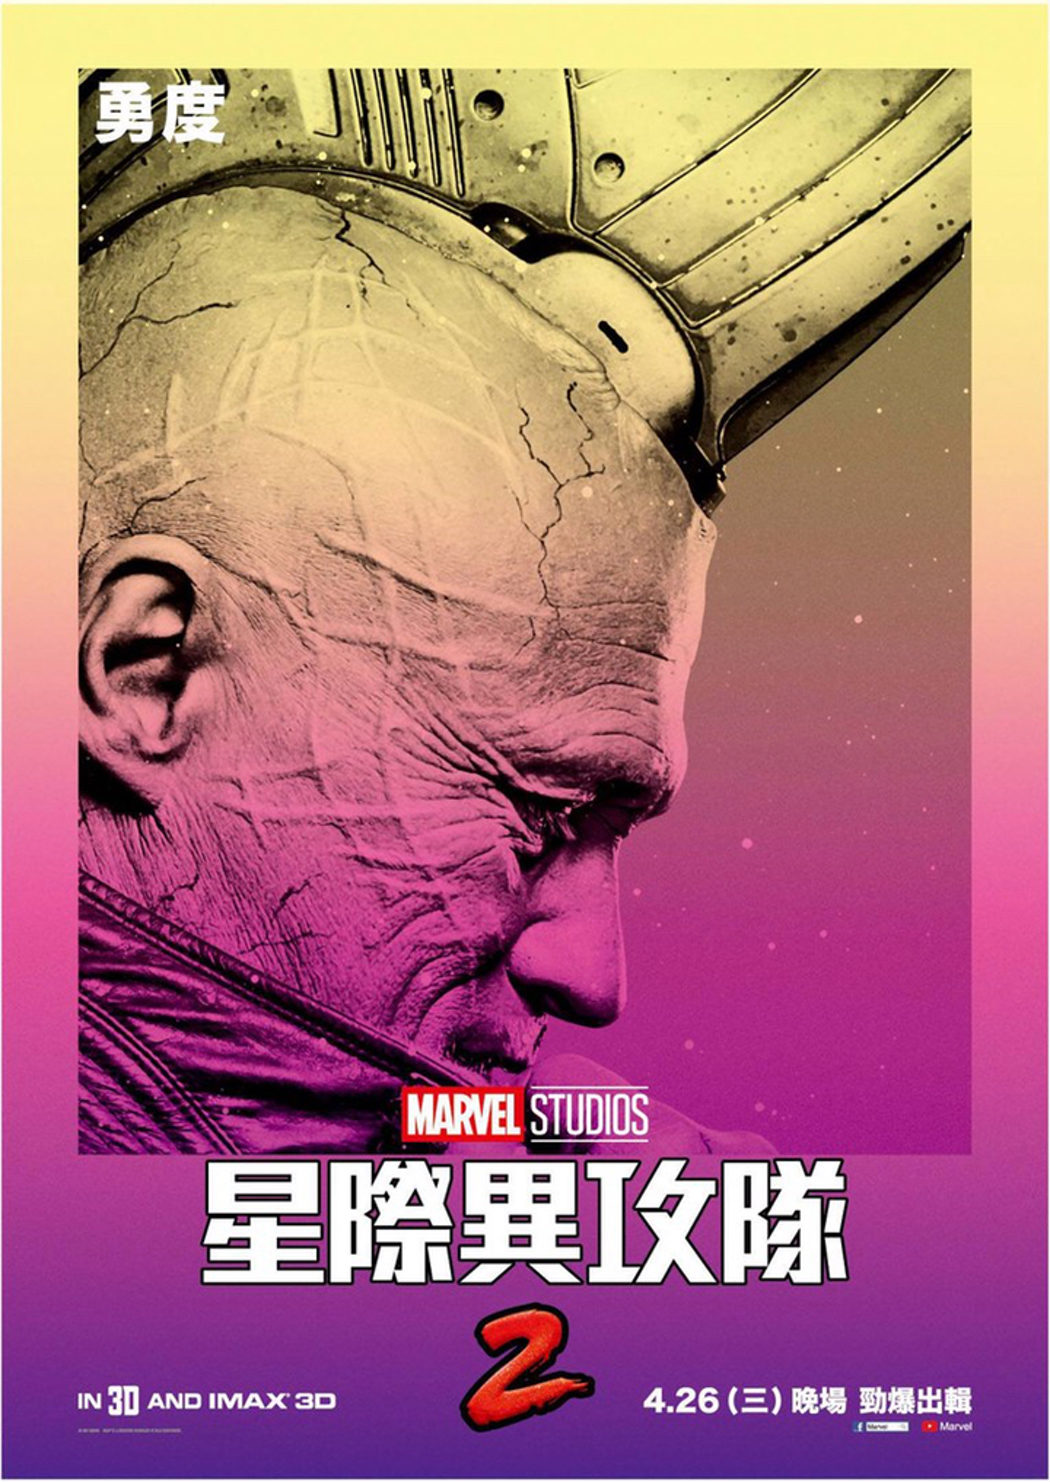 Nuevo póster de Yondu